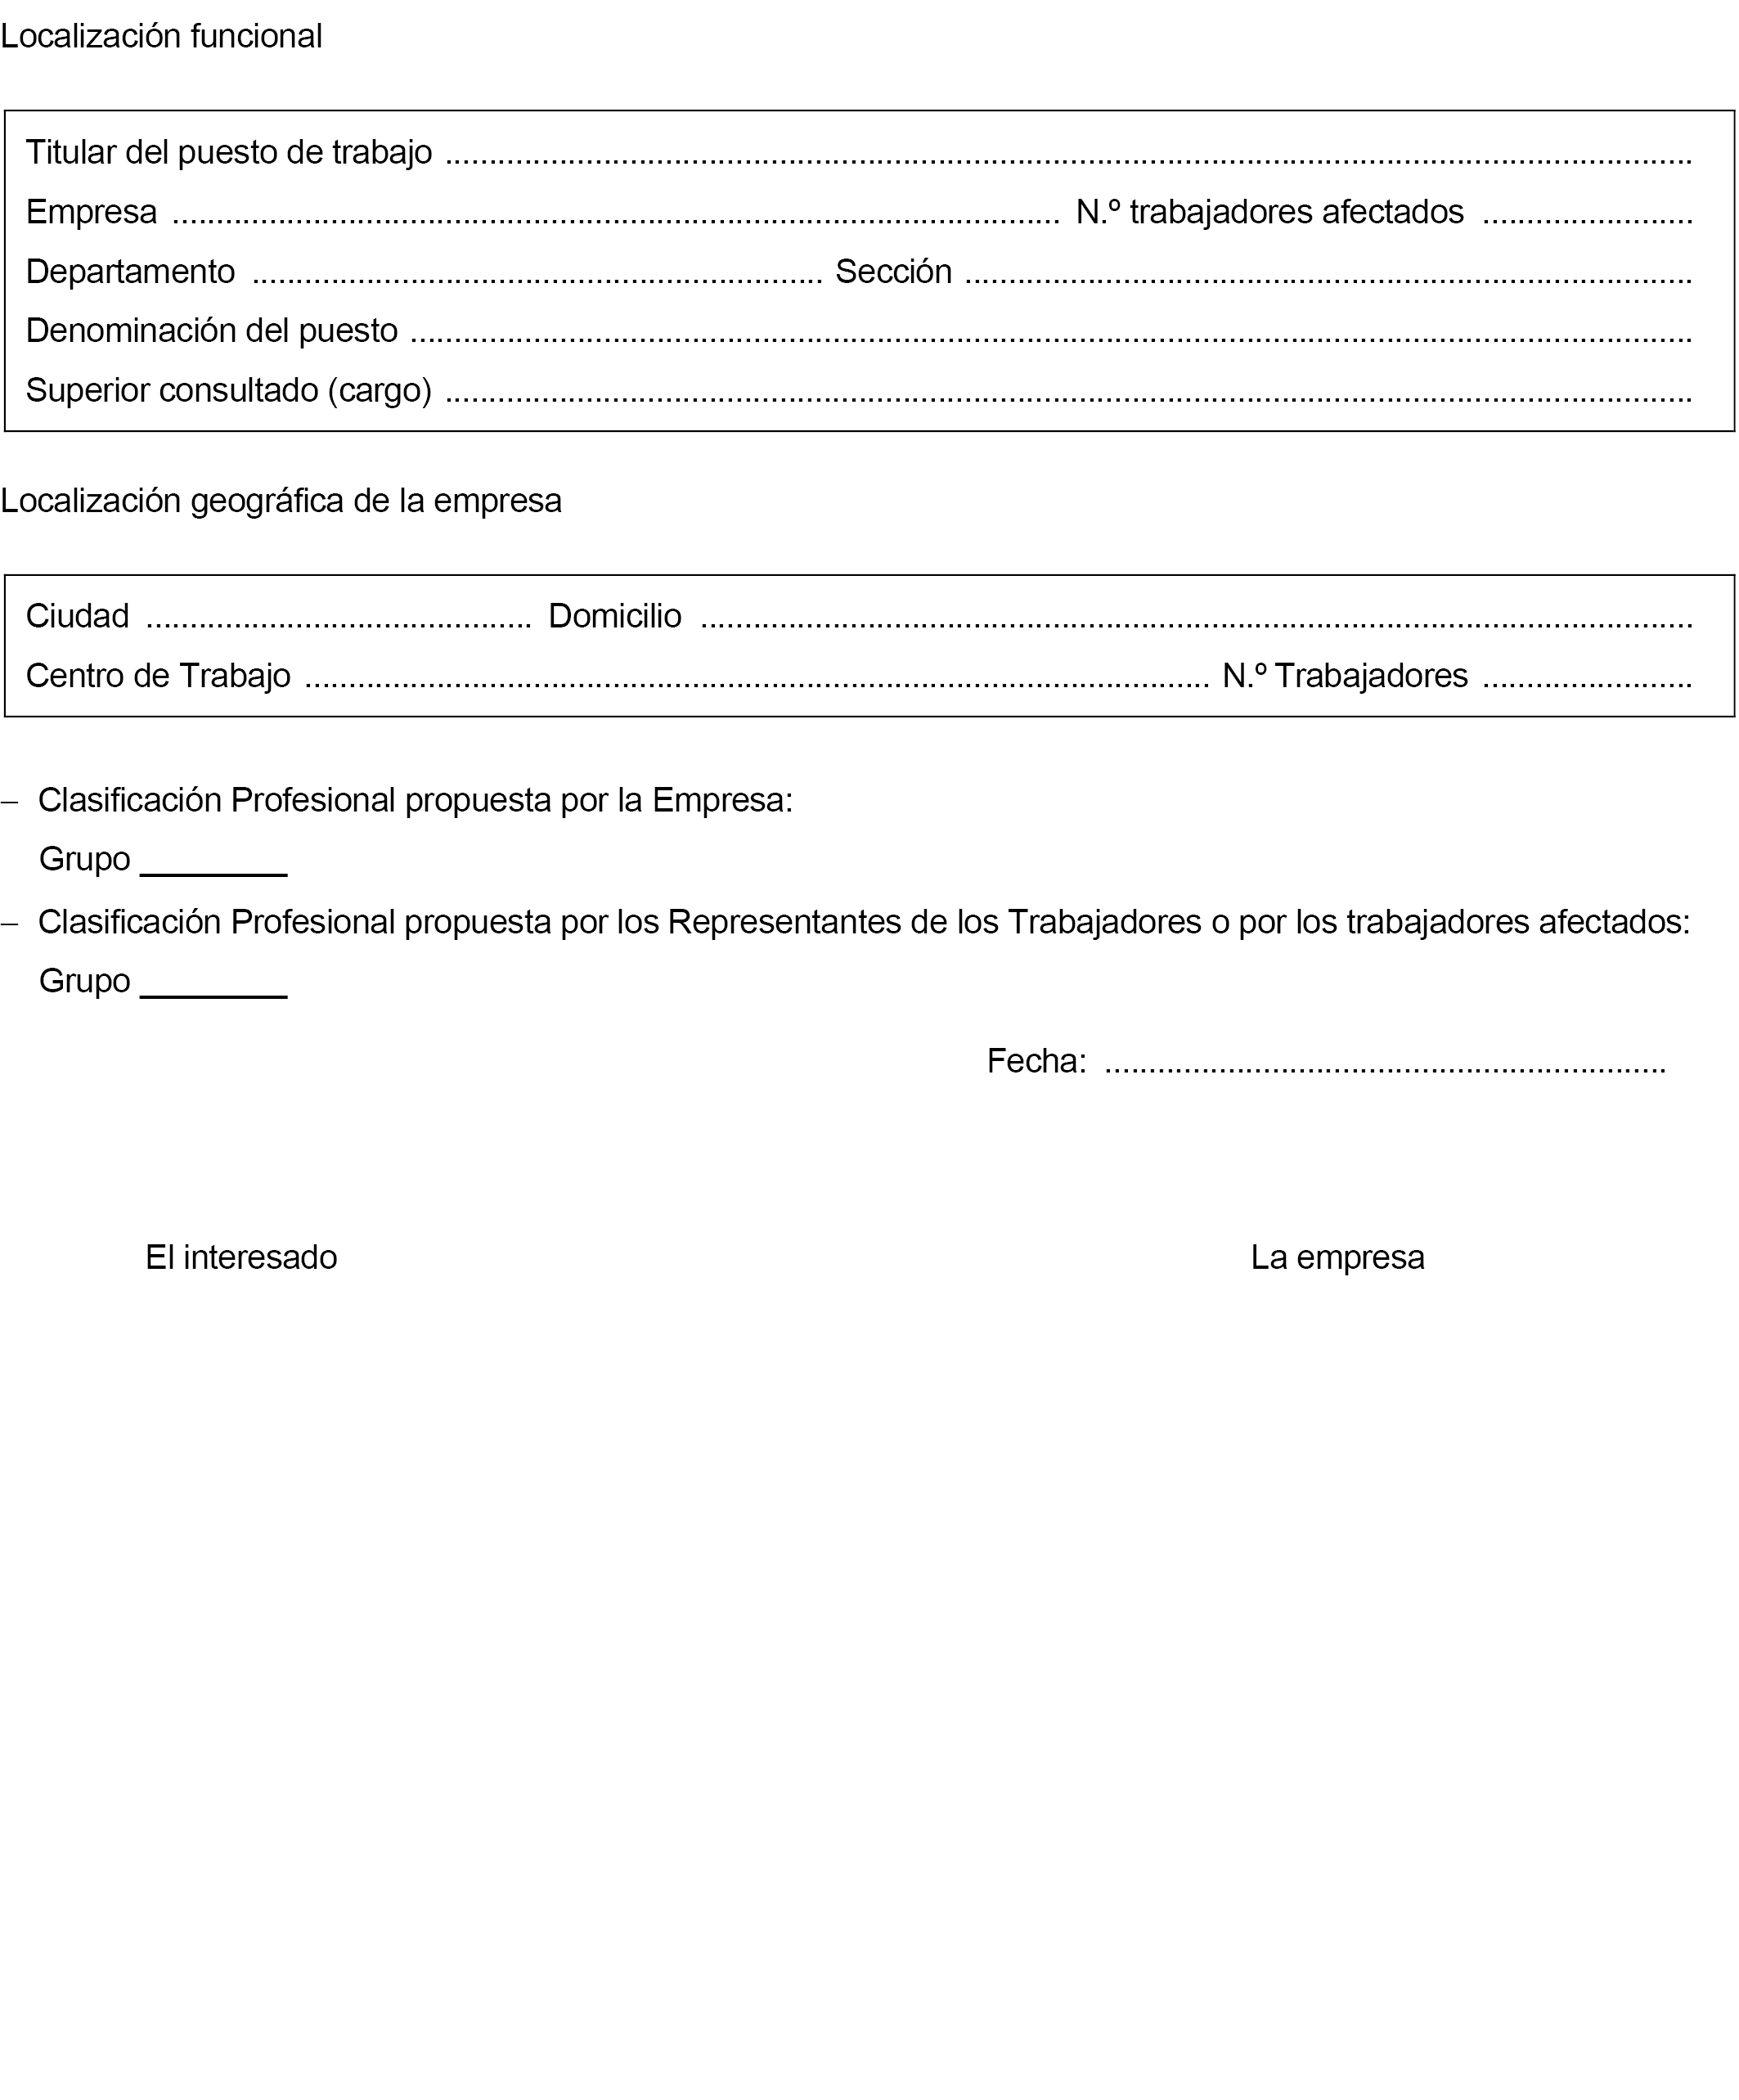 BOE.es - Documento BOE-A-2018-11368